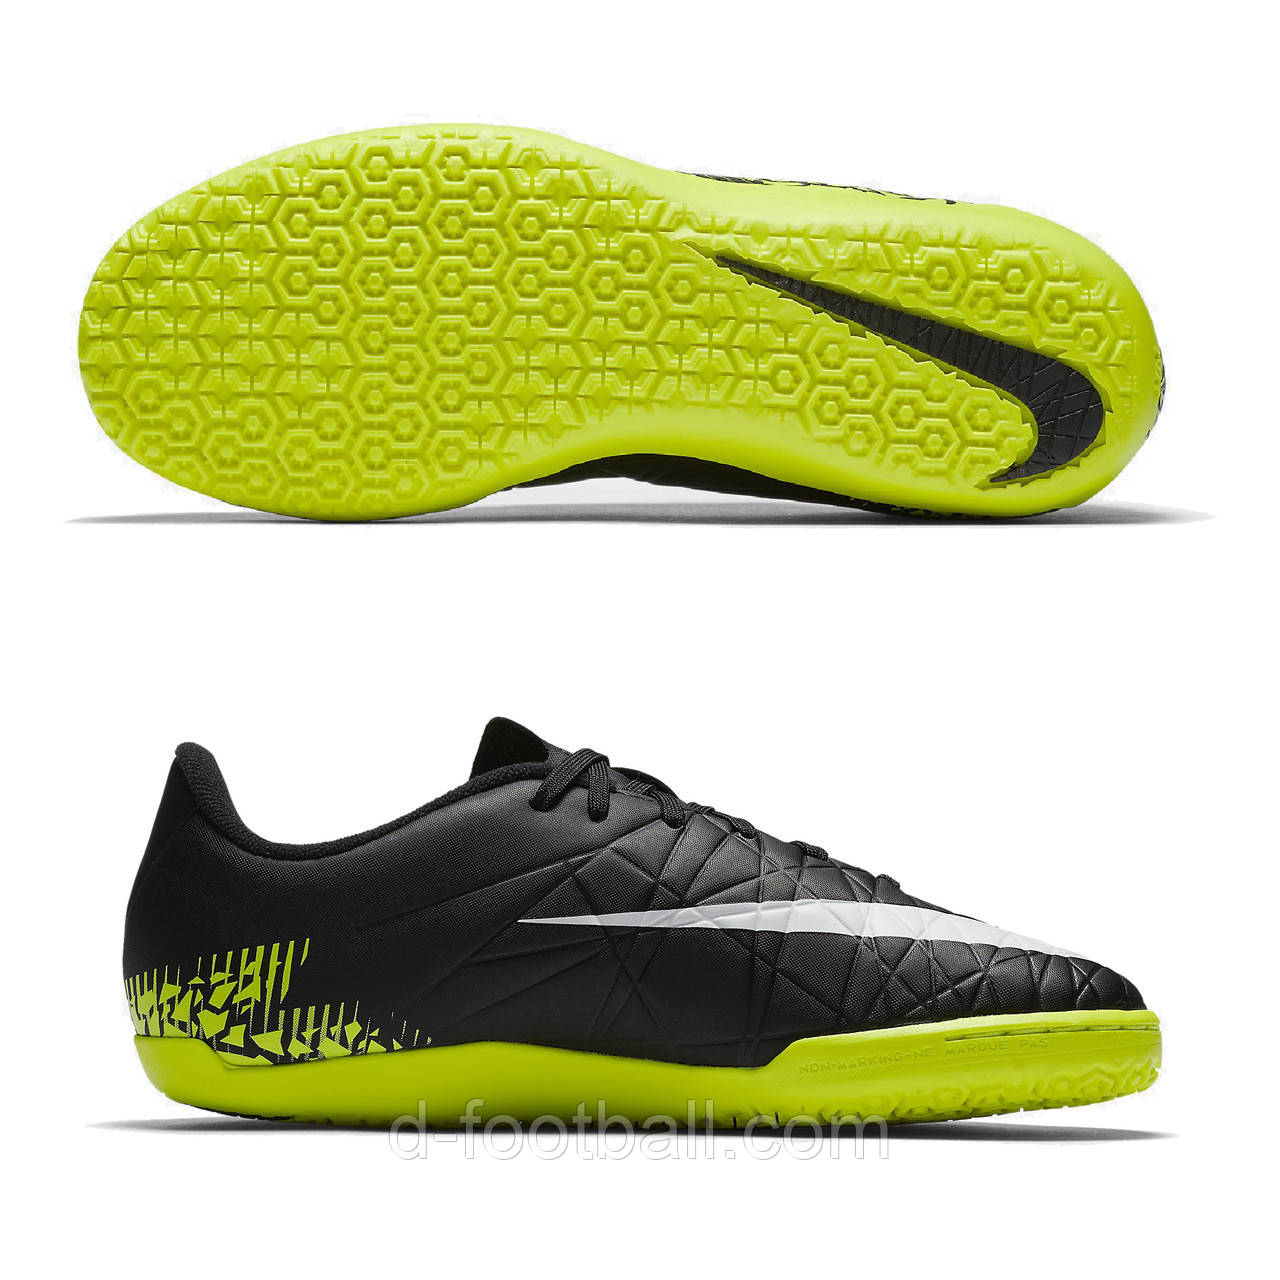 Детские футзалки Nike HypervenomX Phelon II IC JR 749920-017 35 -  Интернет-магазин 2897d03f411